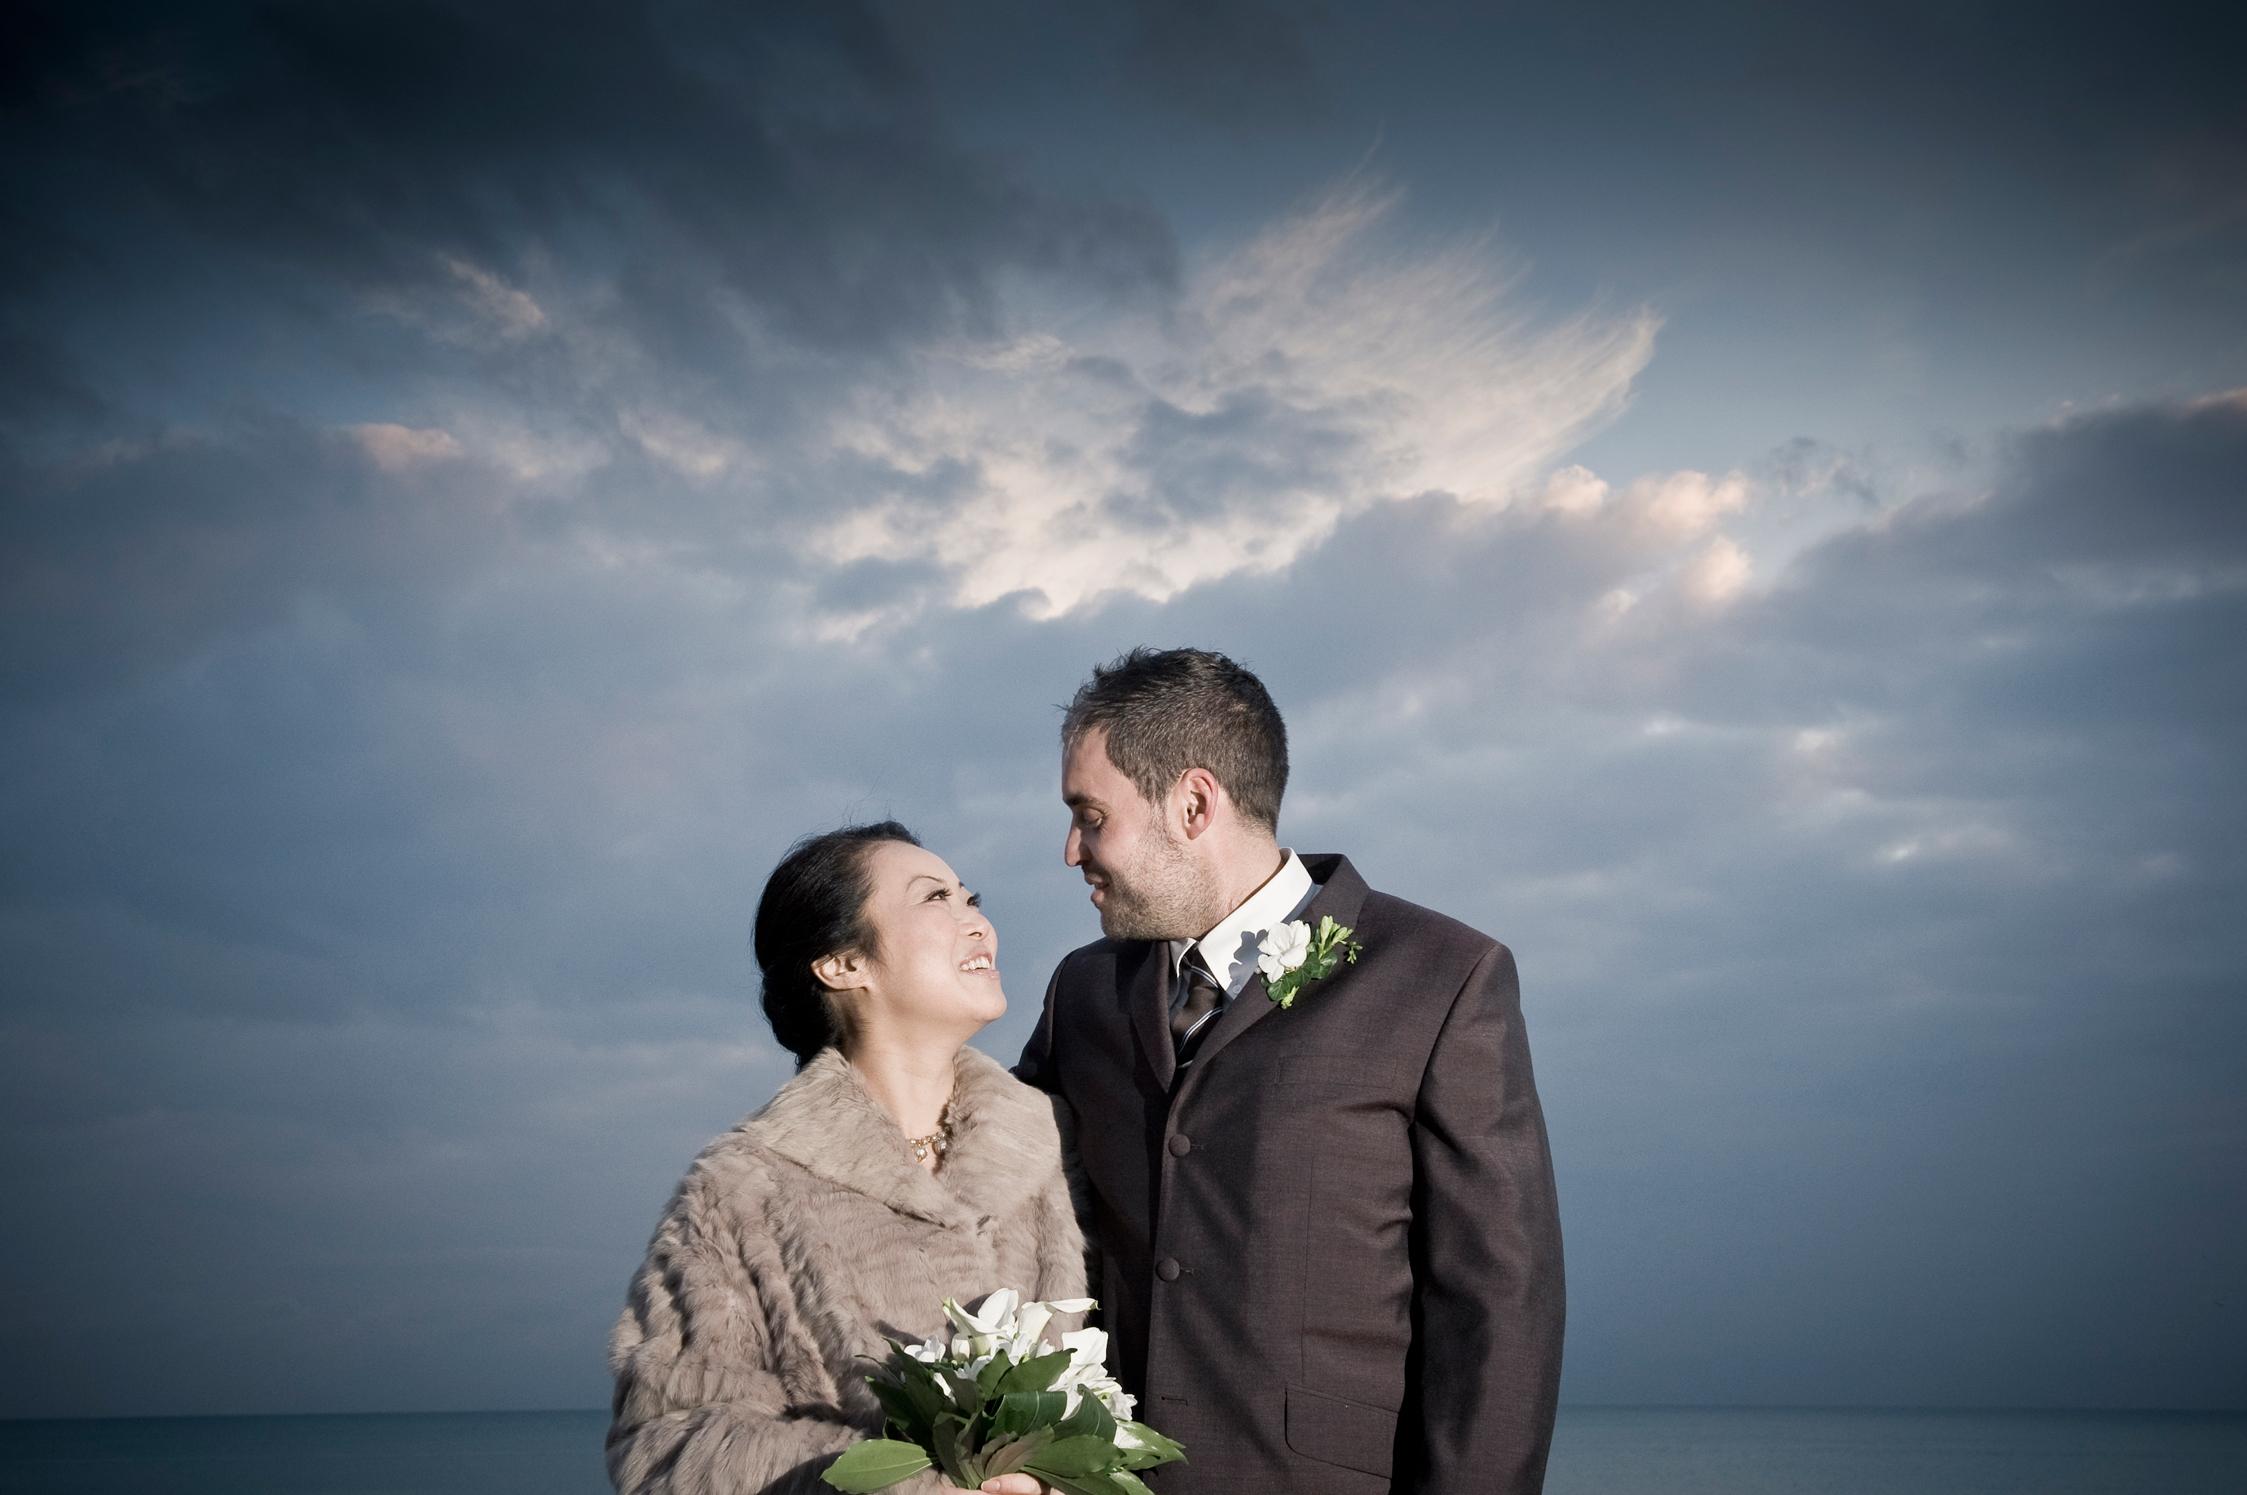 brighton_winter_wedding_13.jpg